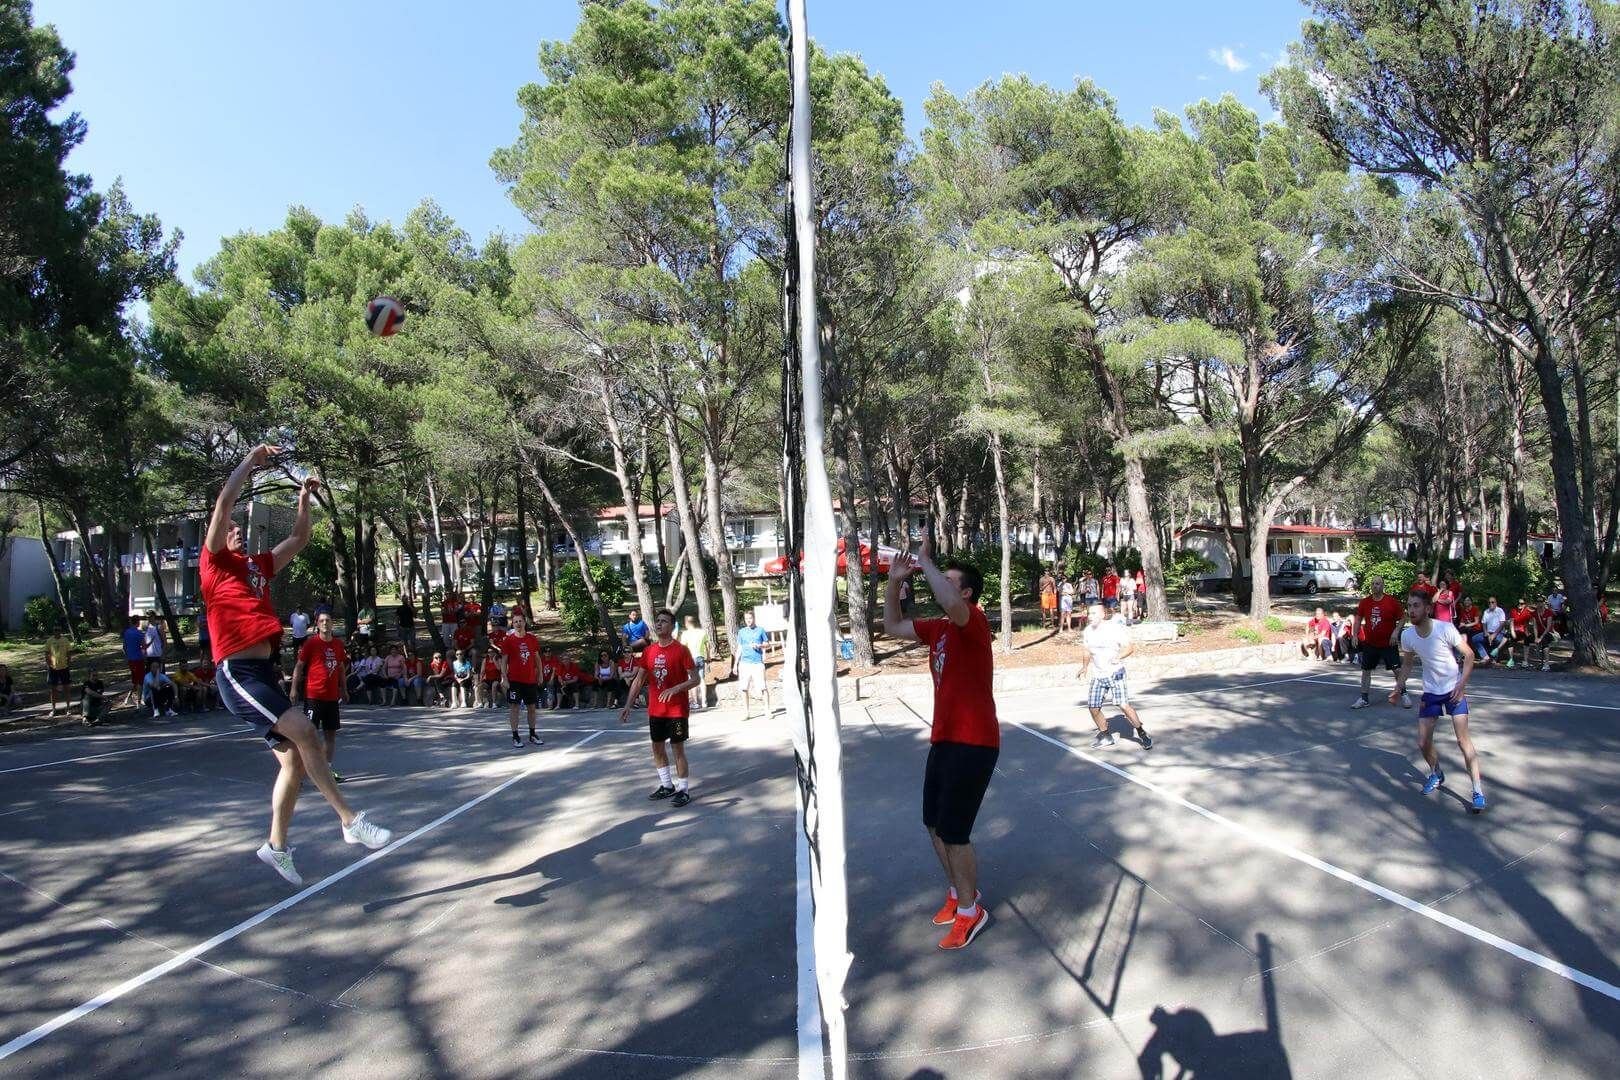 sportski team building